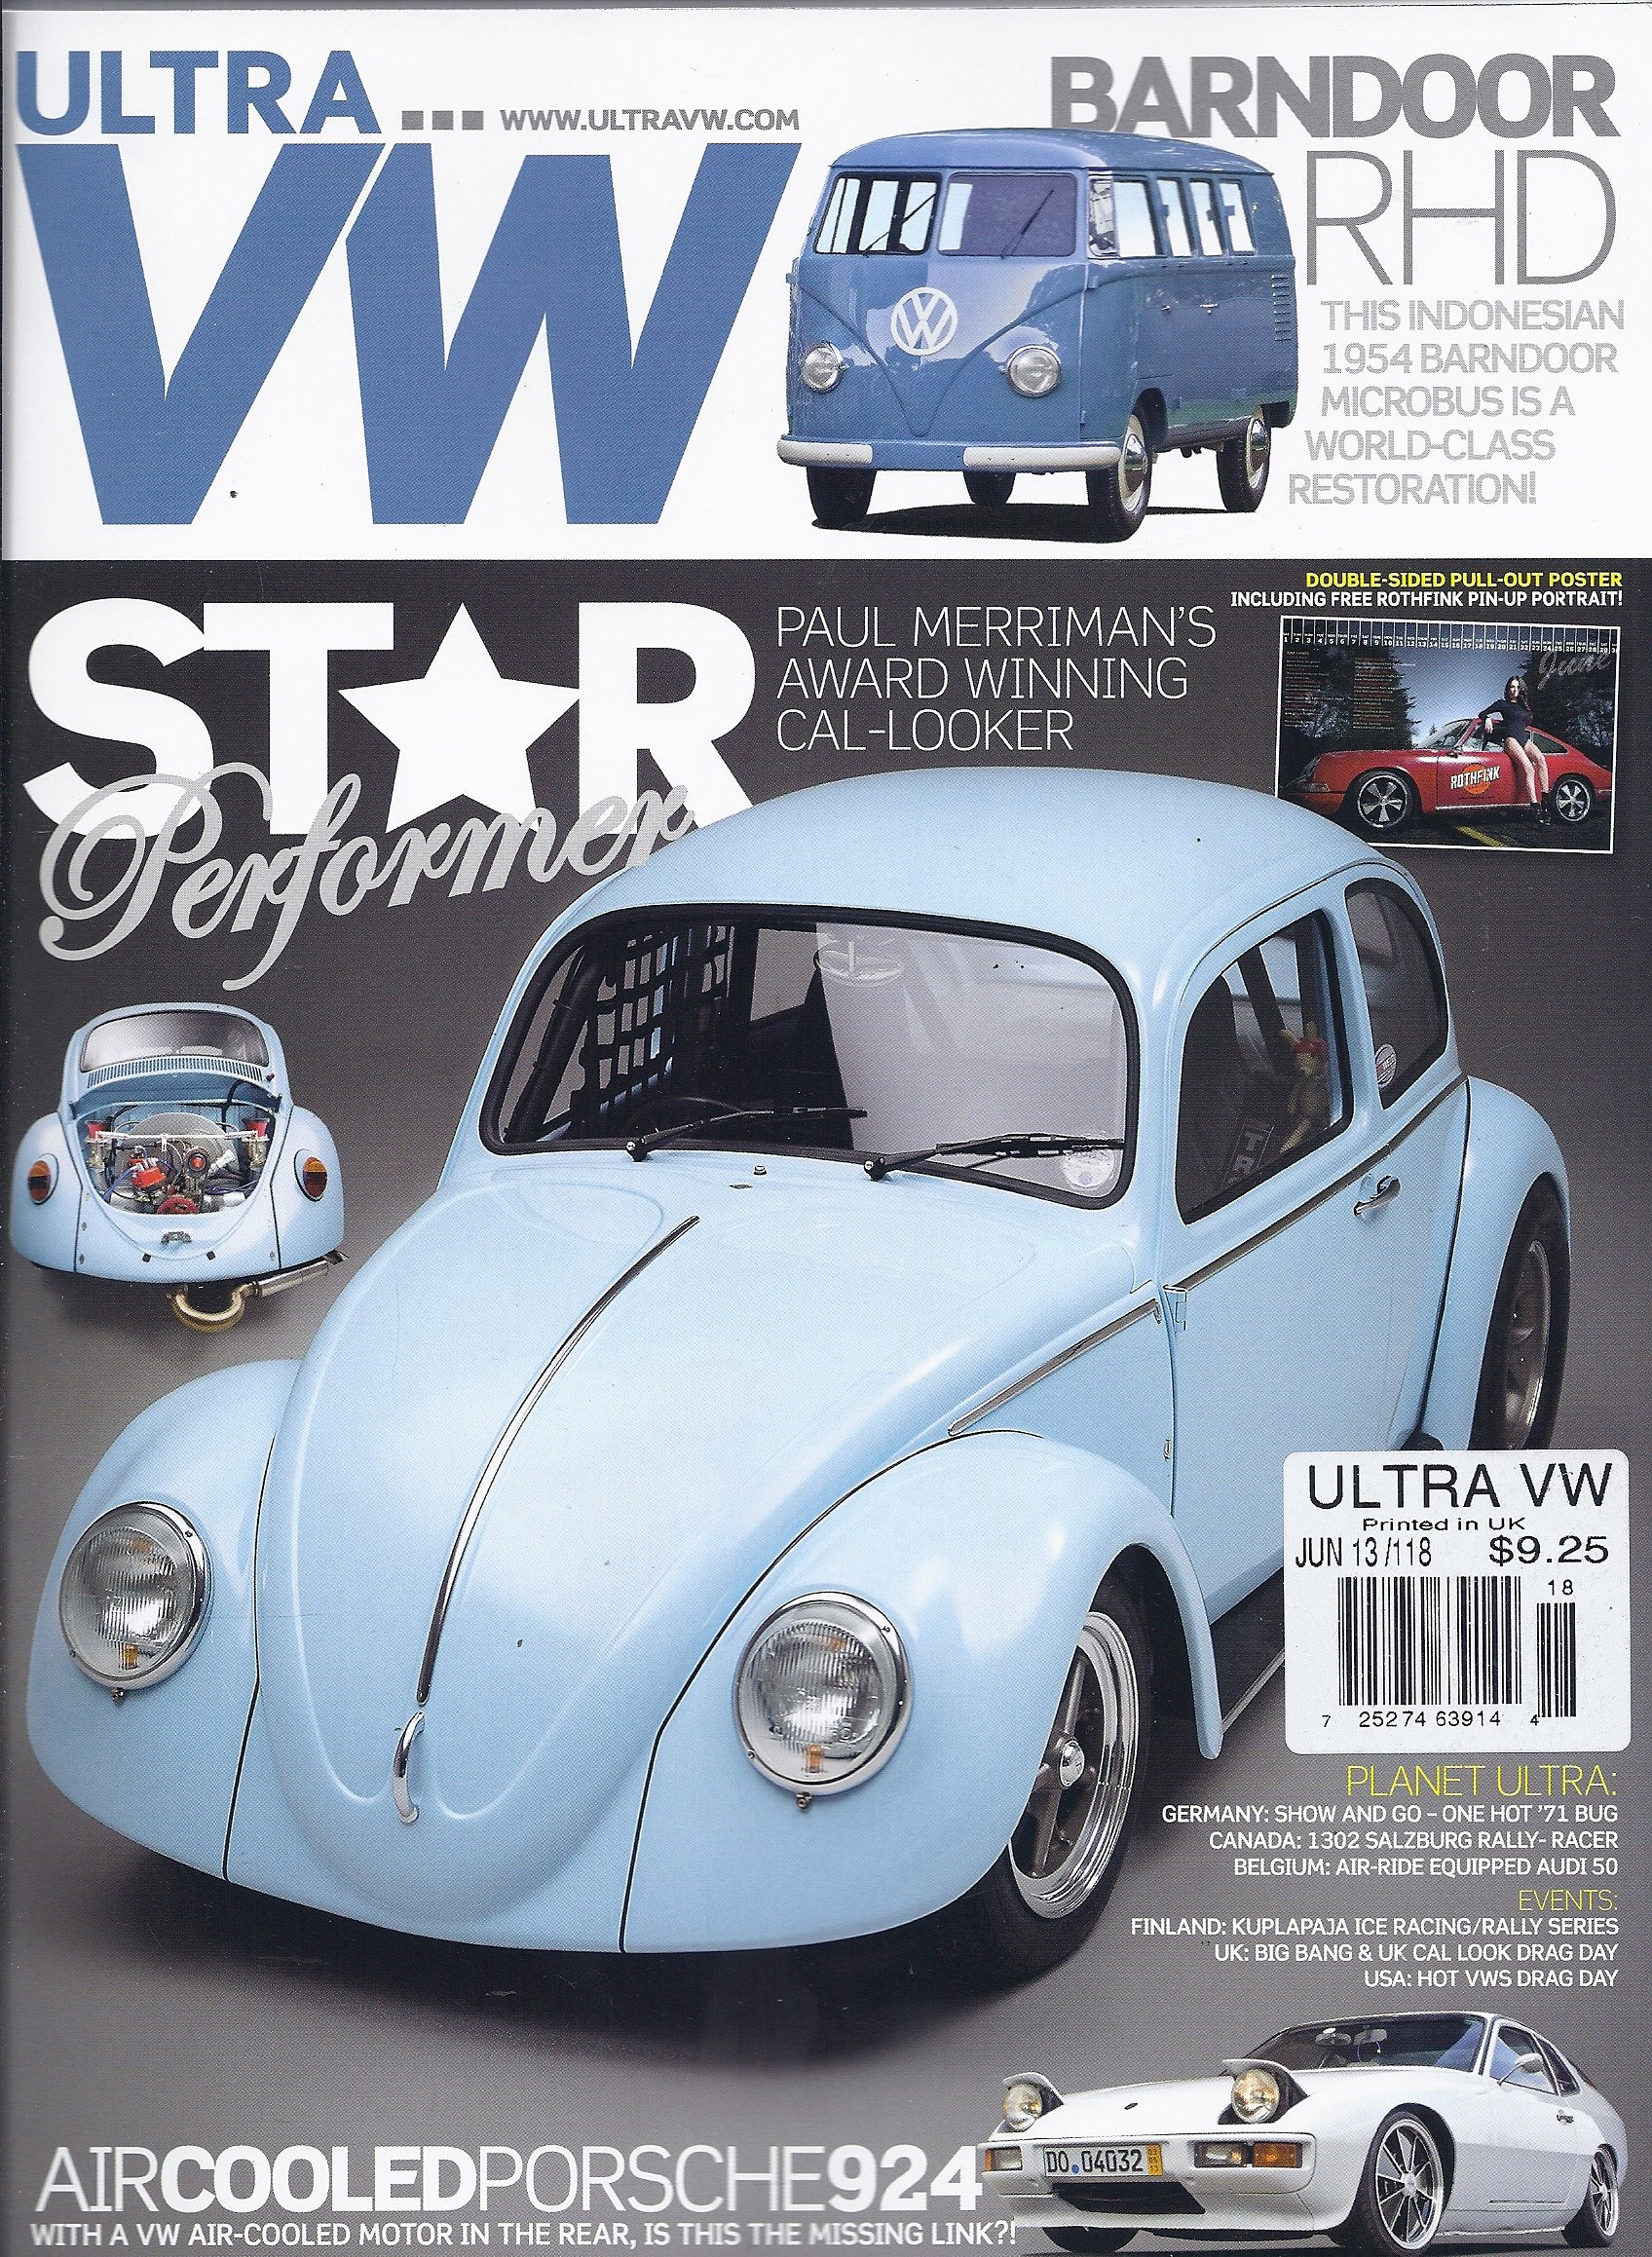 Ultra VW Magazine (June 2013) Text fb2 book